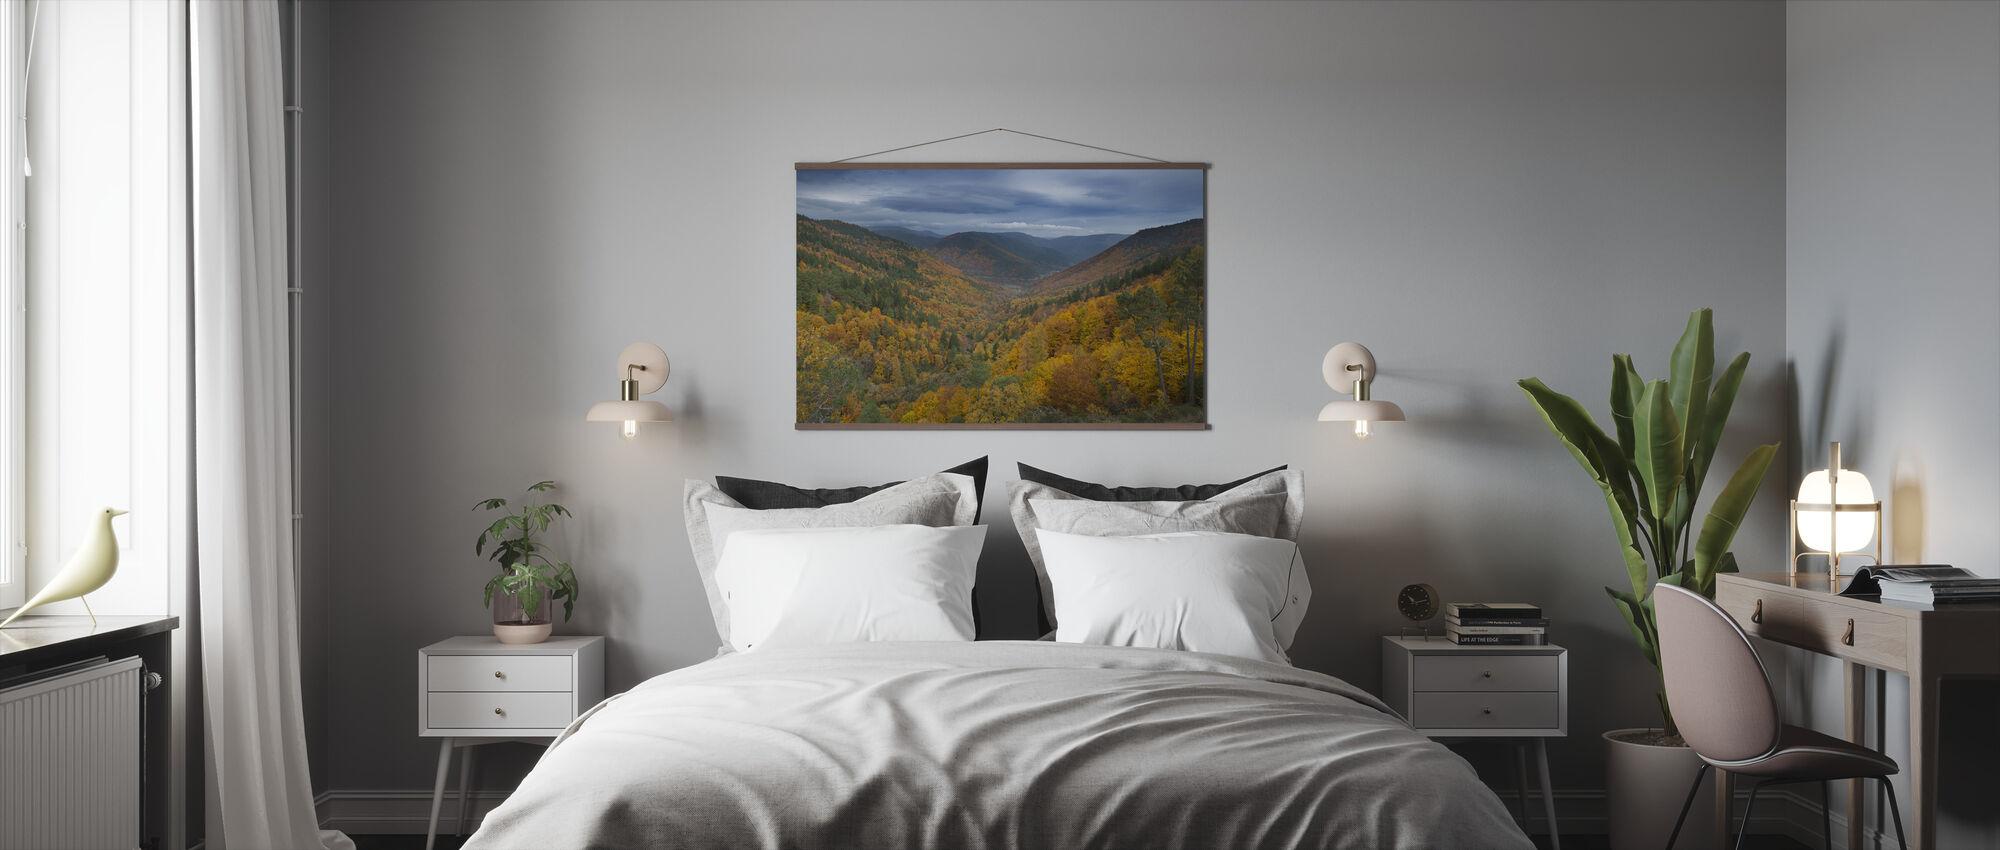 Forest in the Estrela Mountain Range - Poster - Bedroom